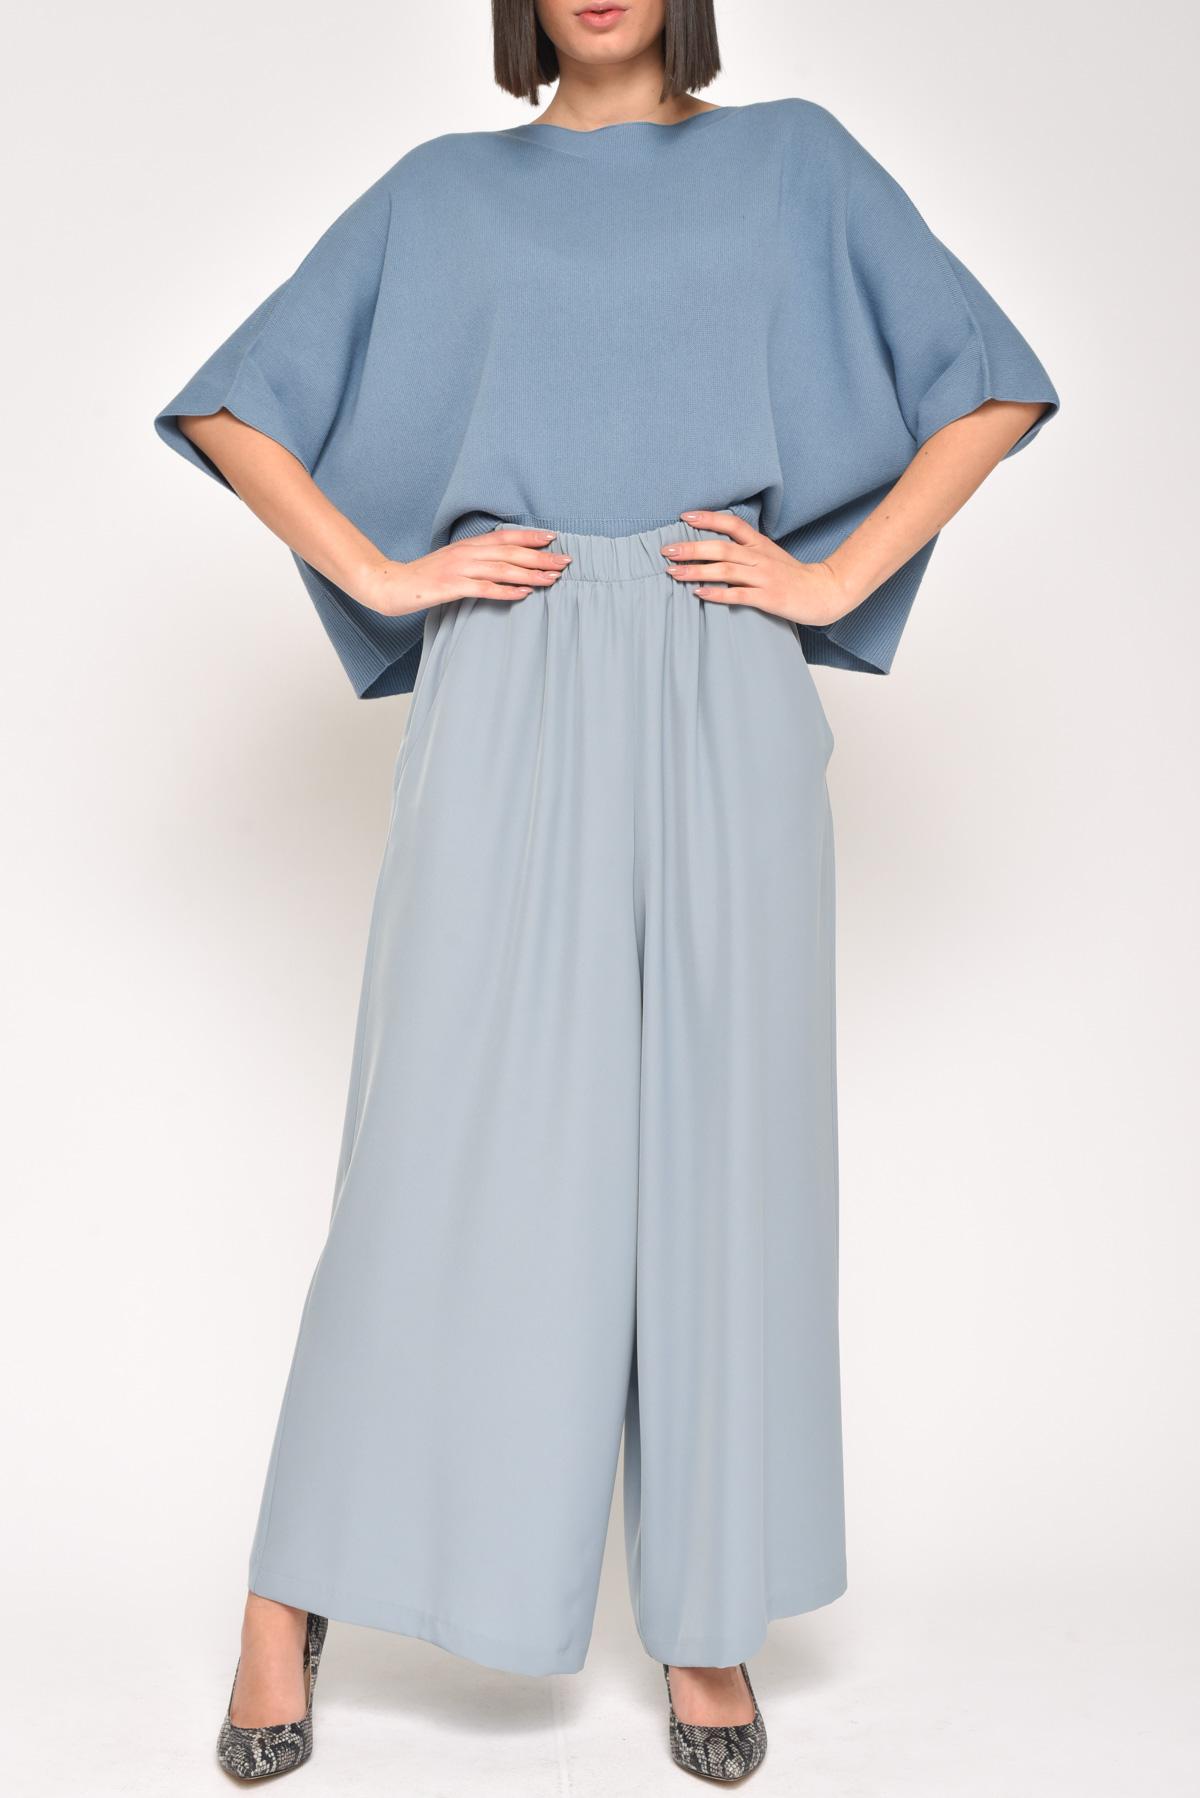 ELEGANT PALACE TROUSERS for women - AVIO - Paquito Pronto Moda Shop Online